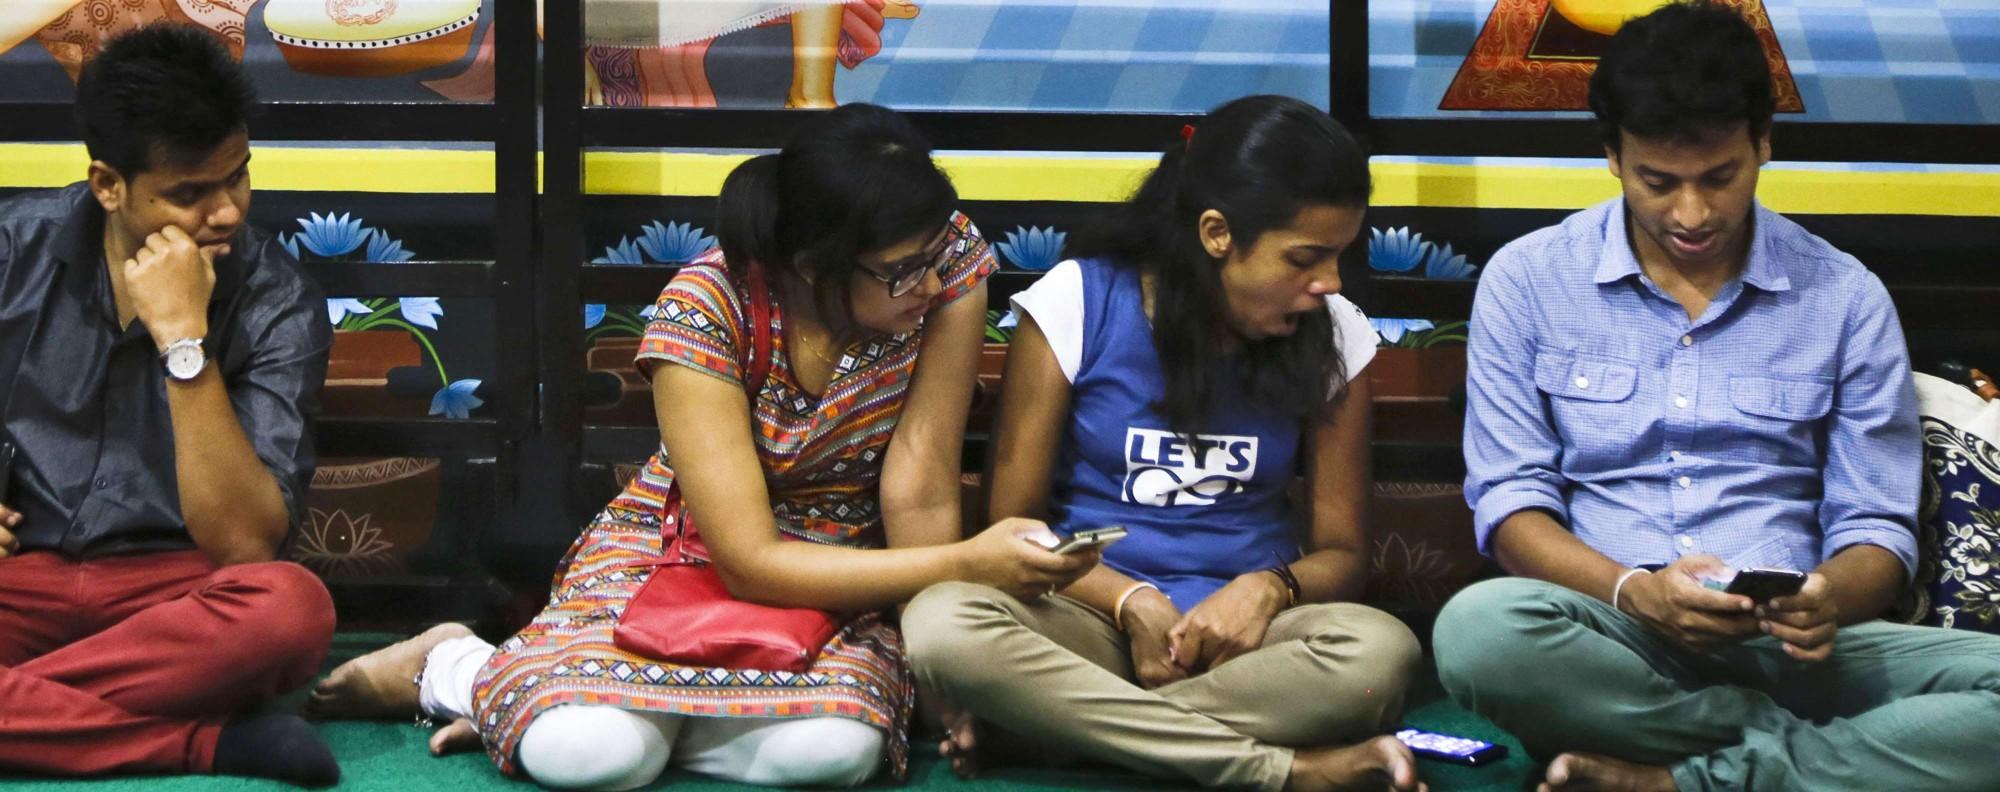 Mobile phone users in Kolkata, India. Photo: AP